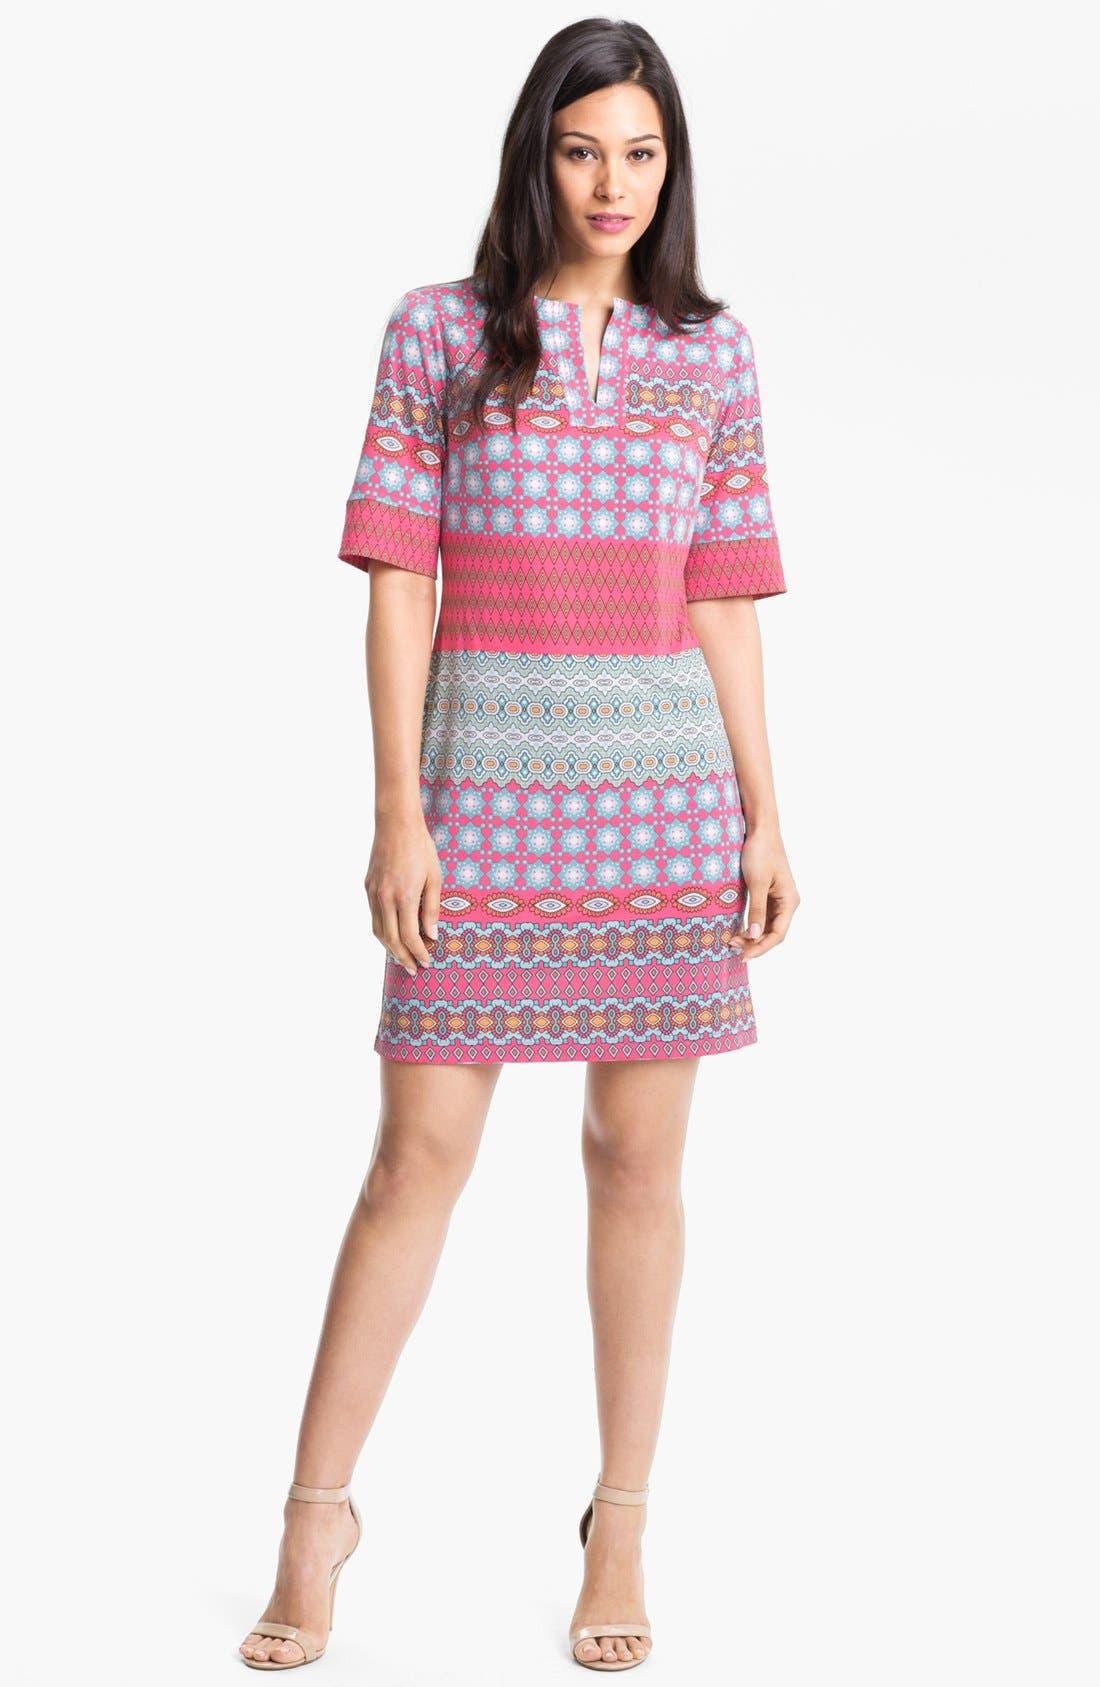 Alternate Image 1 Selected - Donna Morgan Print Shift Dress (Petite)